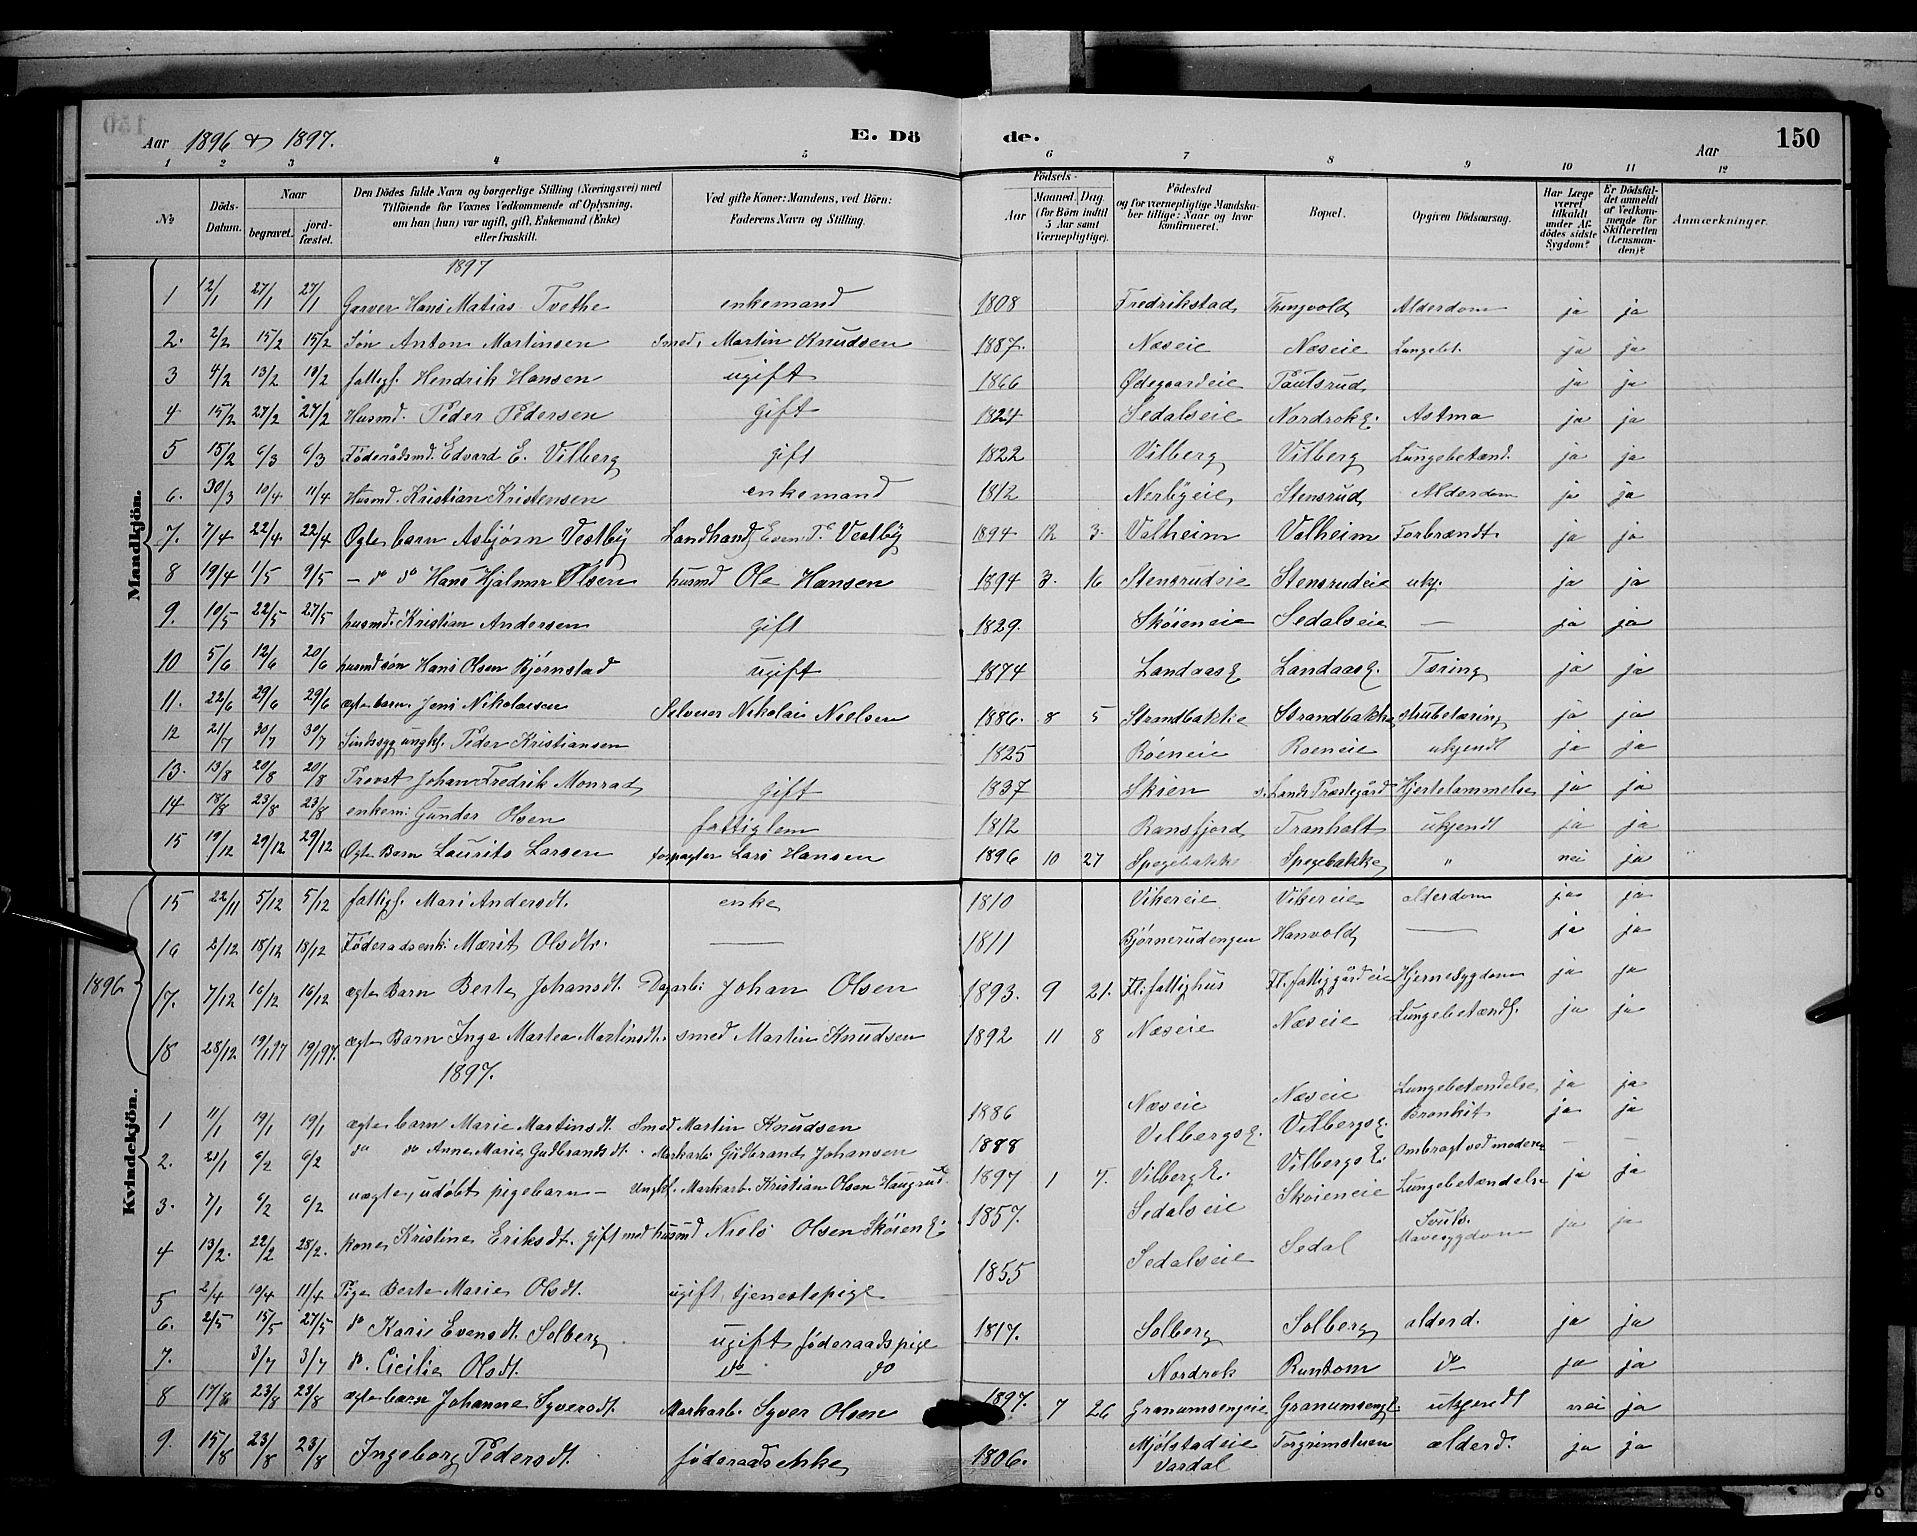 SAH, Søndre Land prestekontor, L/L0003: Klokkerbok nr. 3, 1884-1902, s. 150